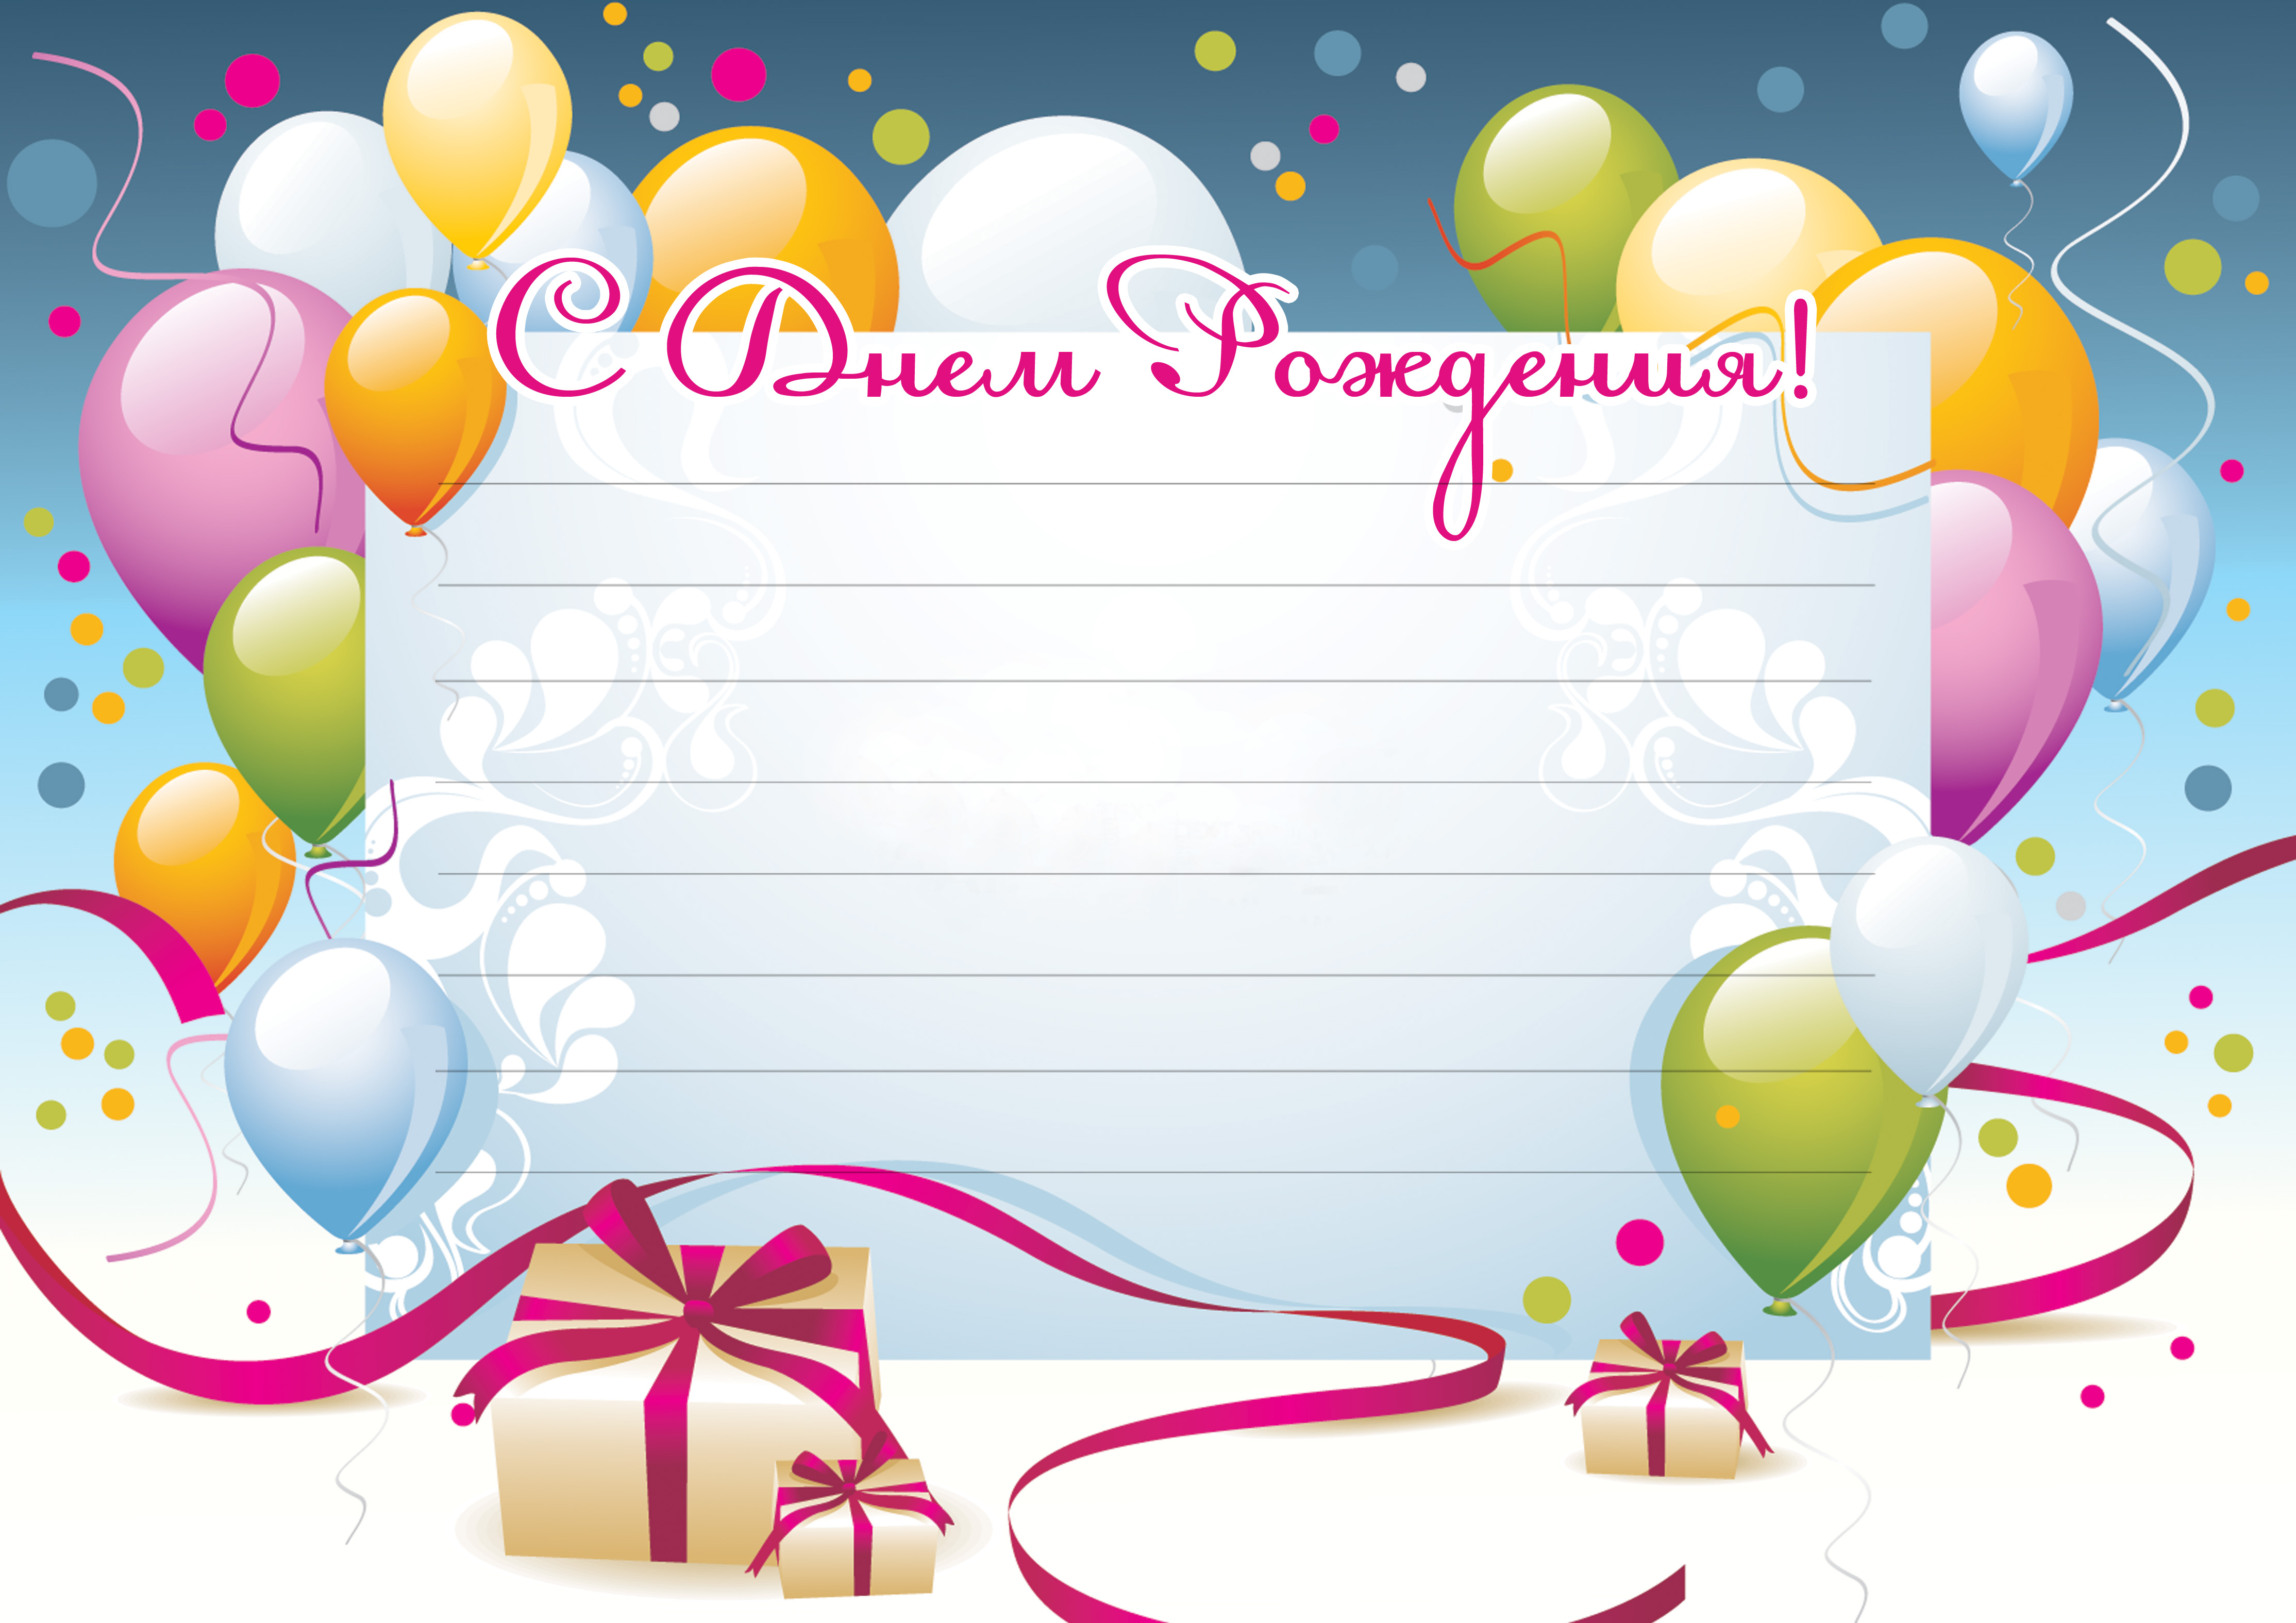 Открытки с днем рождения онлайн